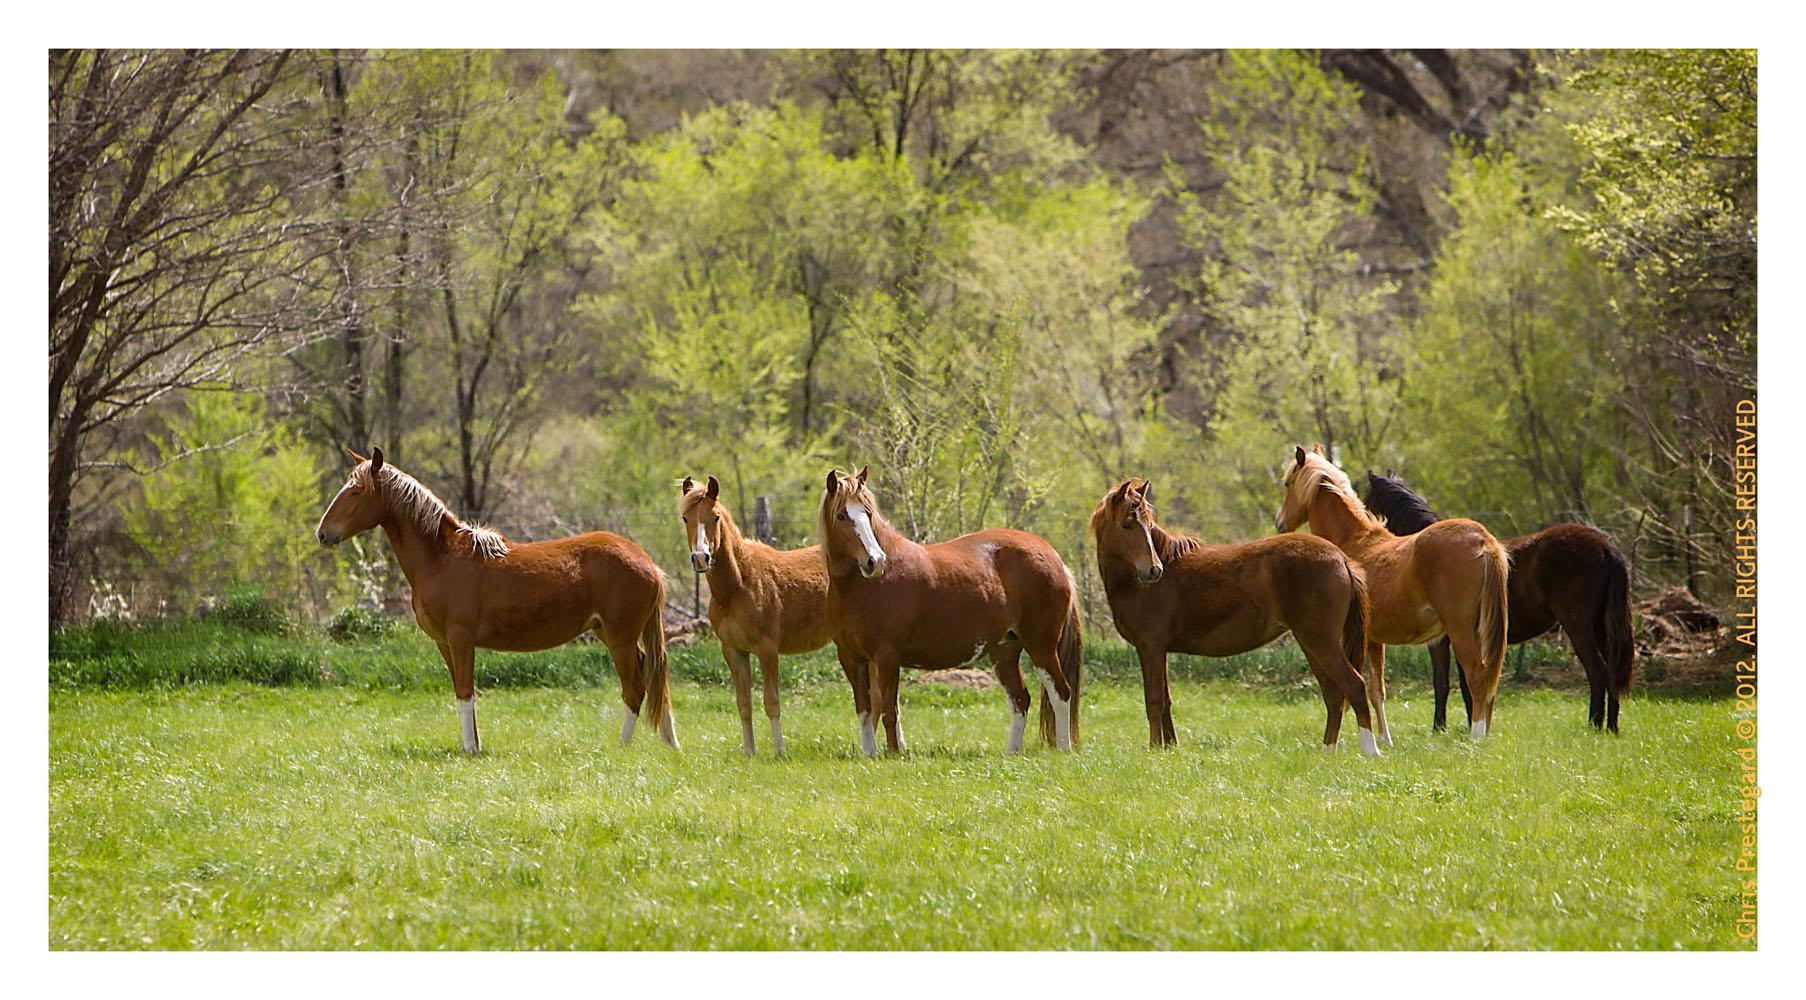 Horse3021-Feb17-2012